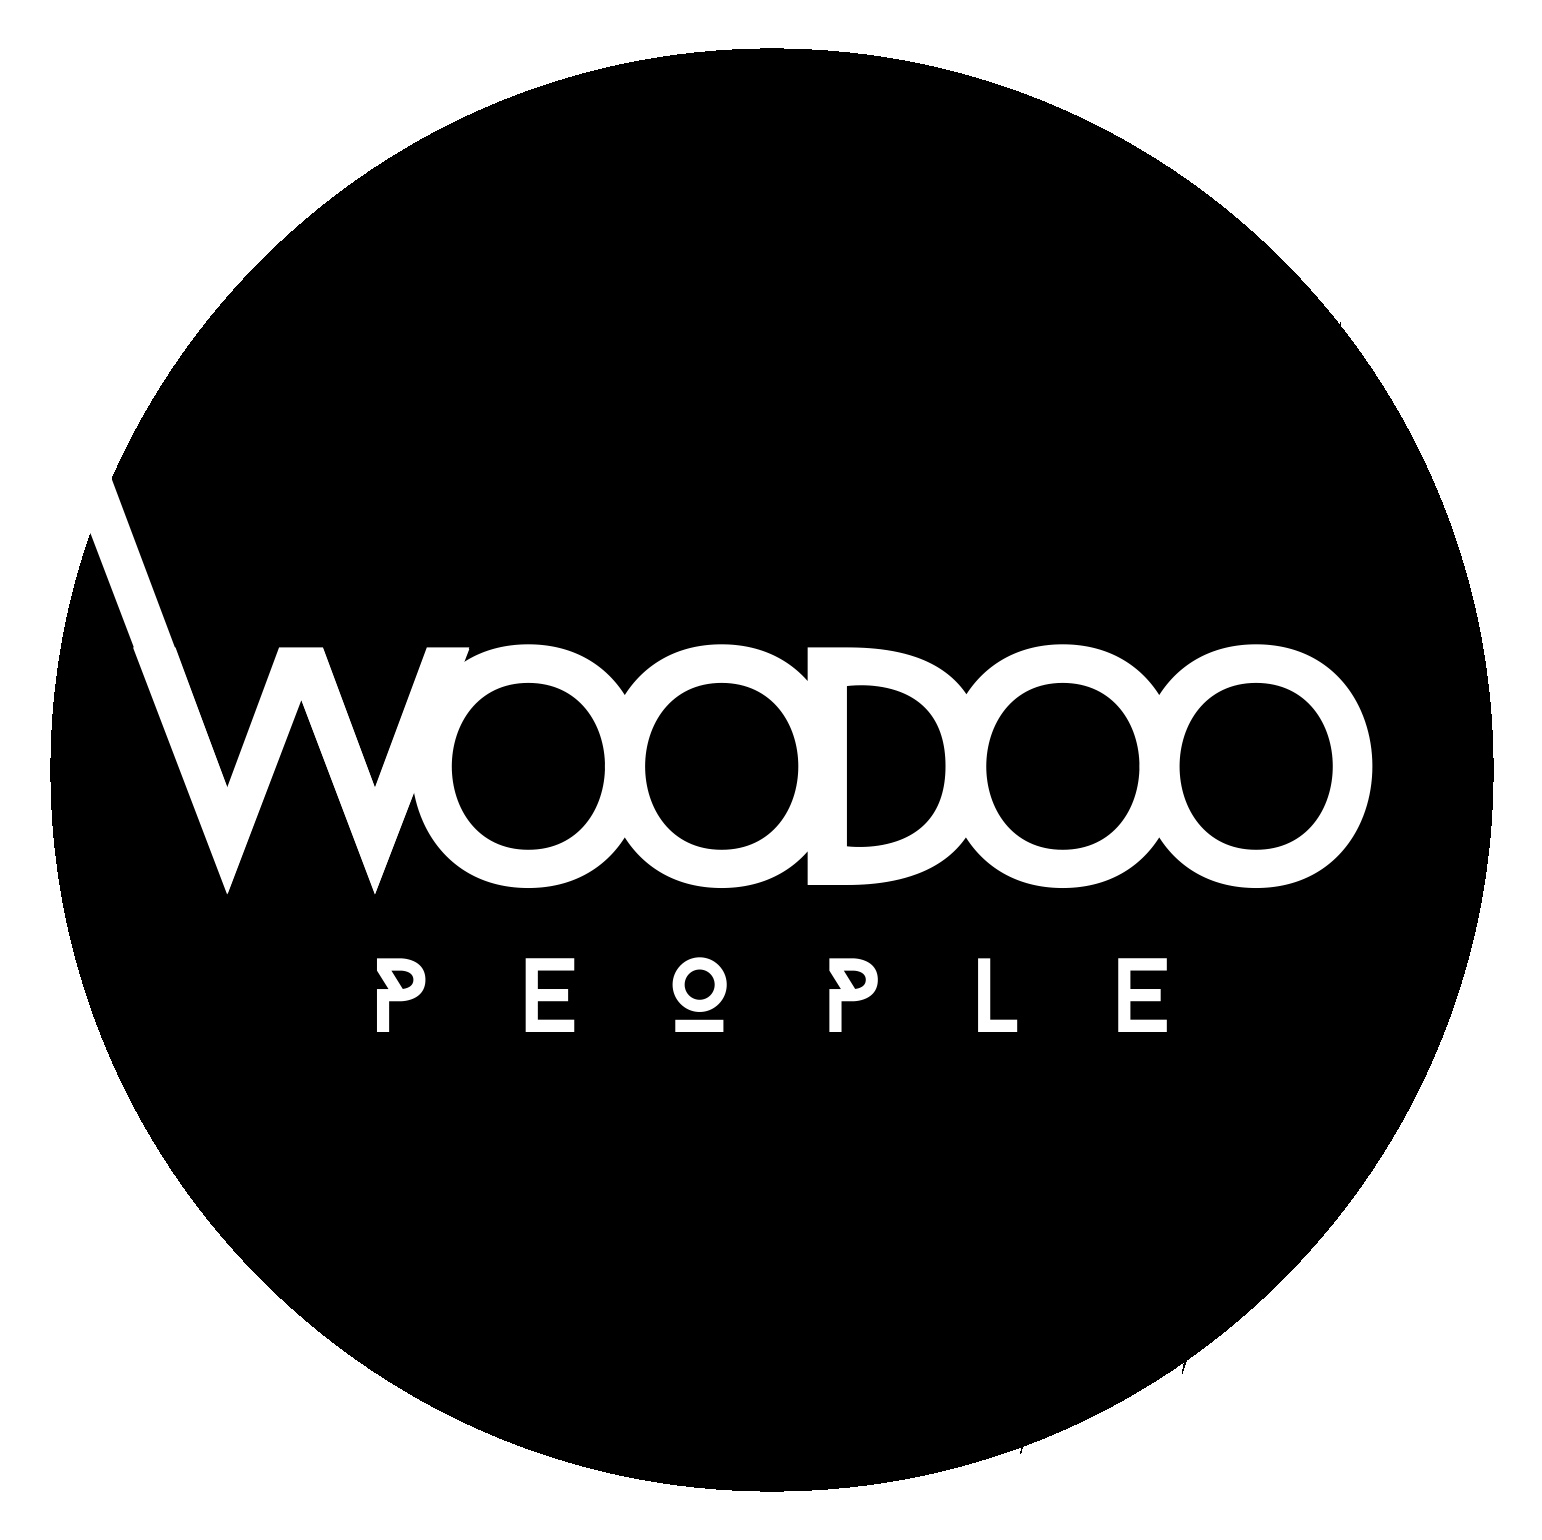 Woodoo People